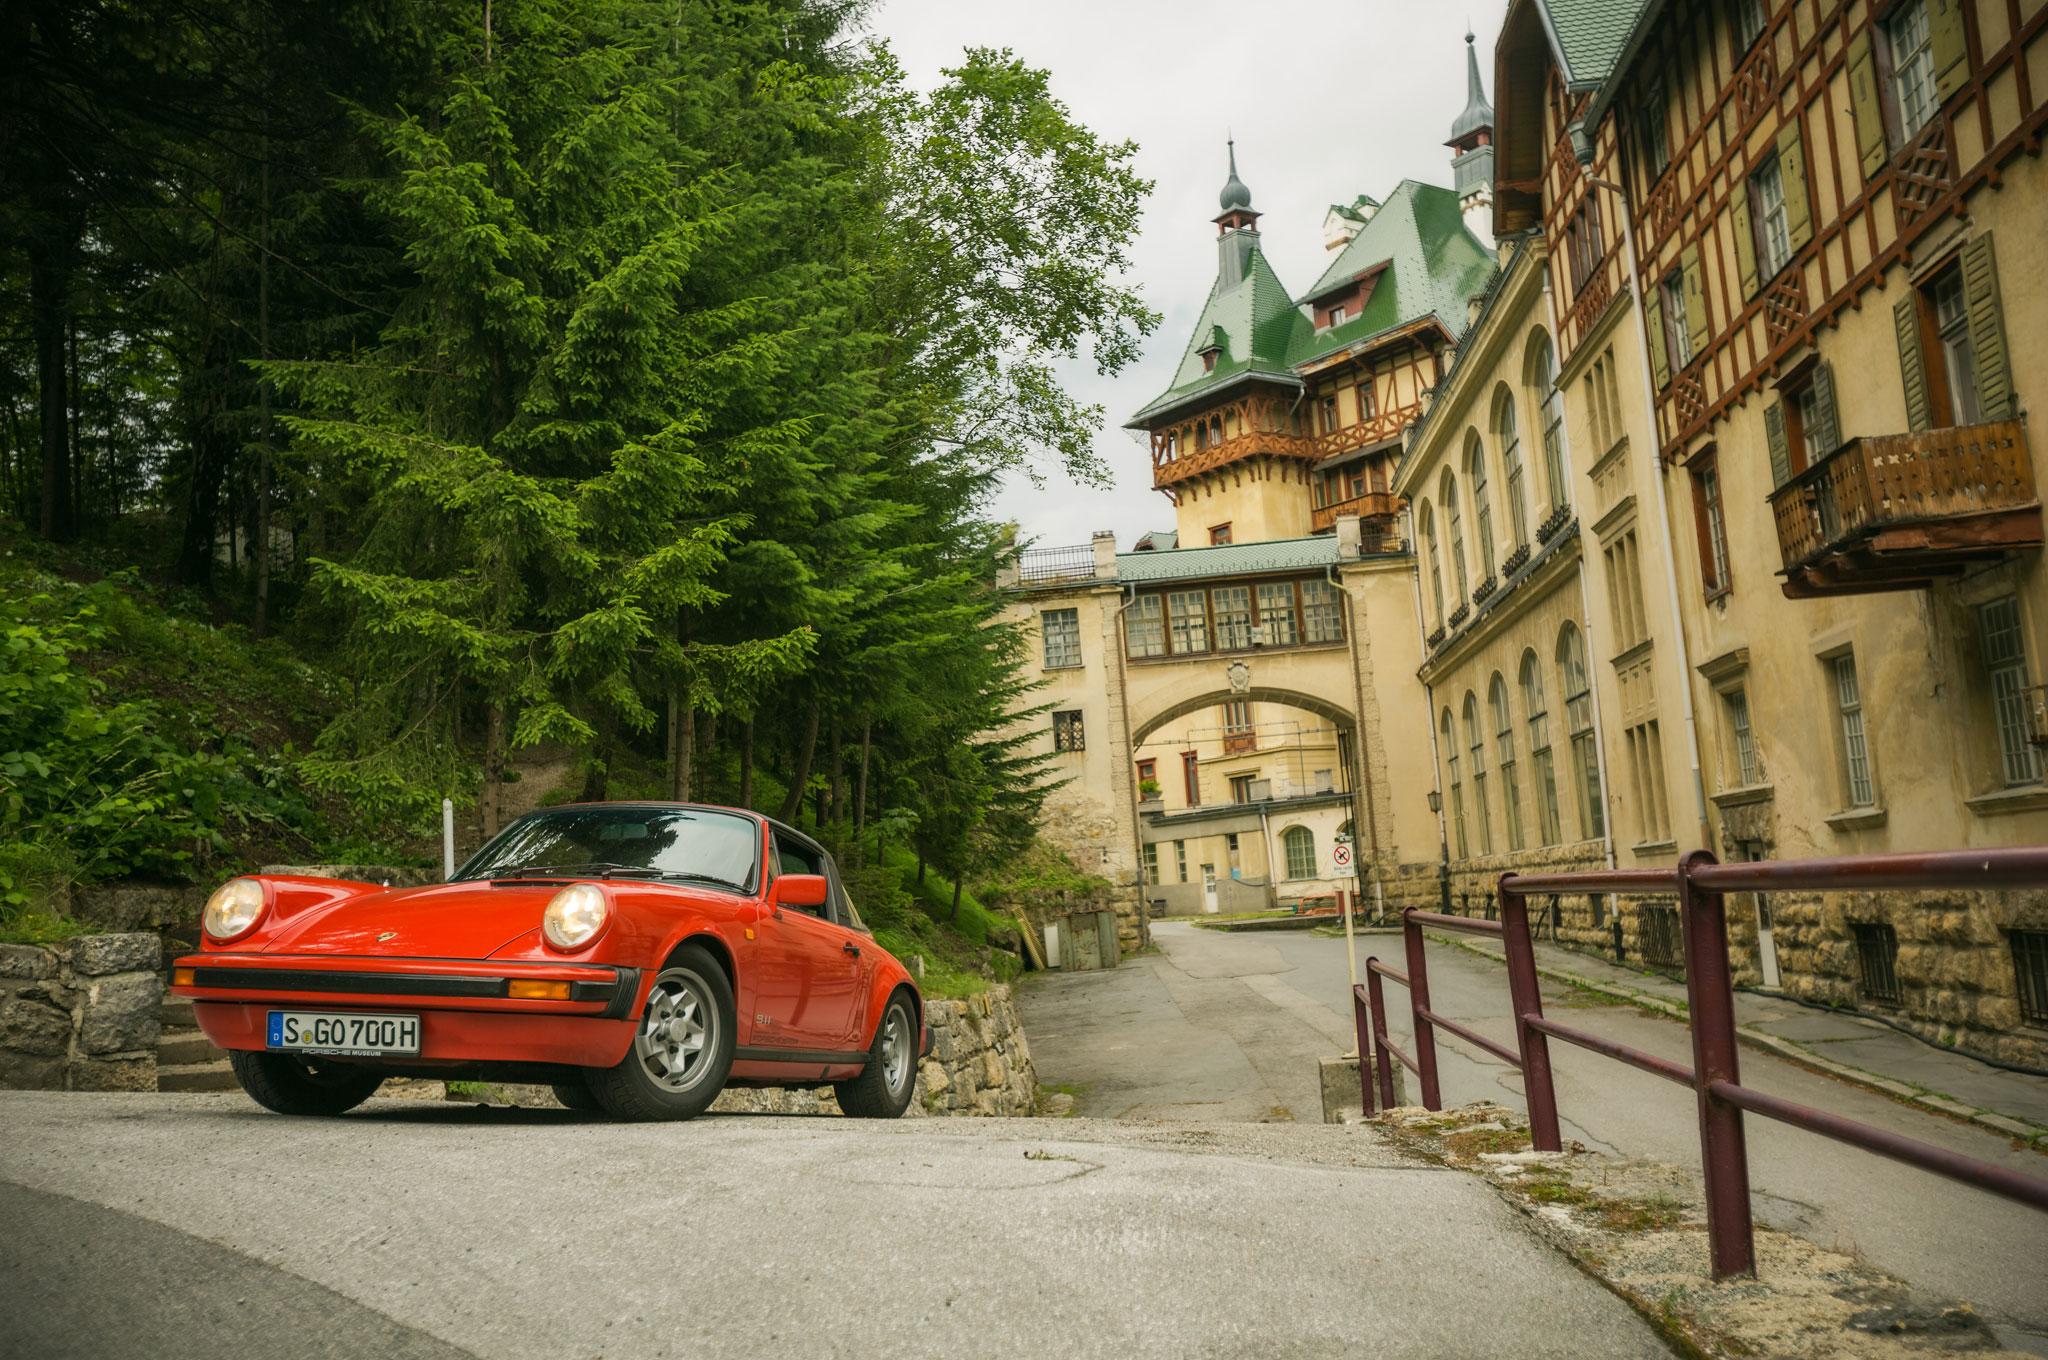 1981 Porsche 911SC Targa Front Left View1